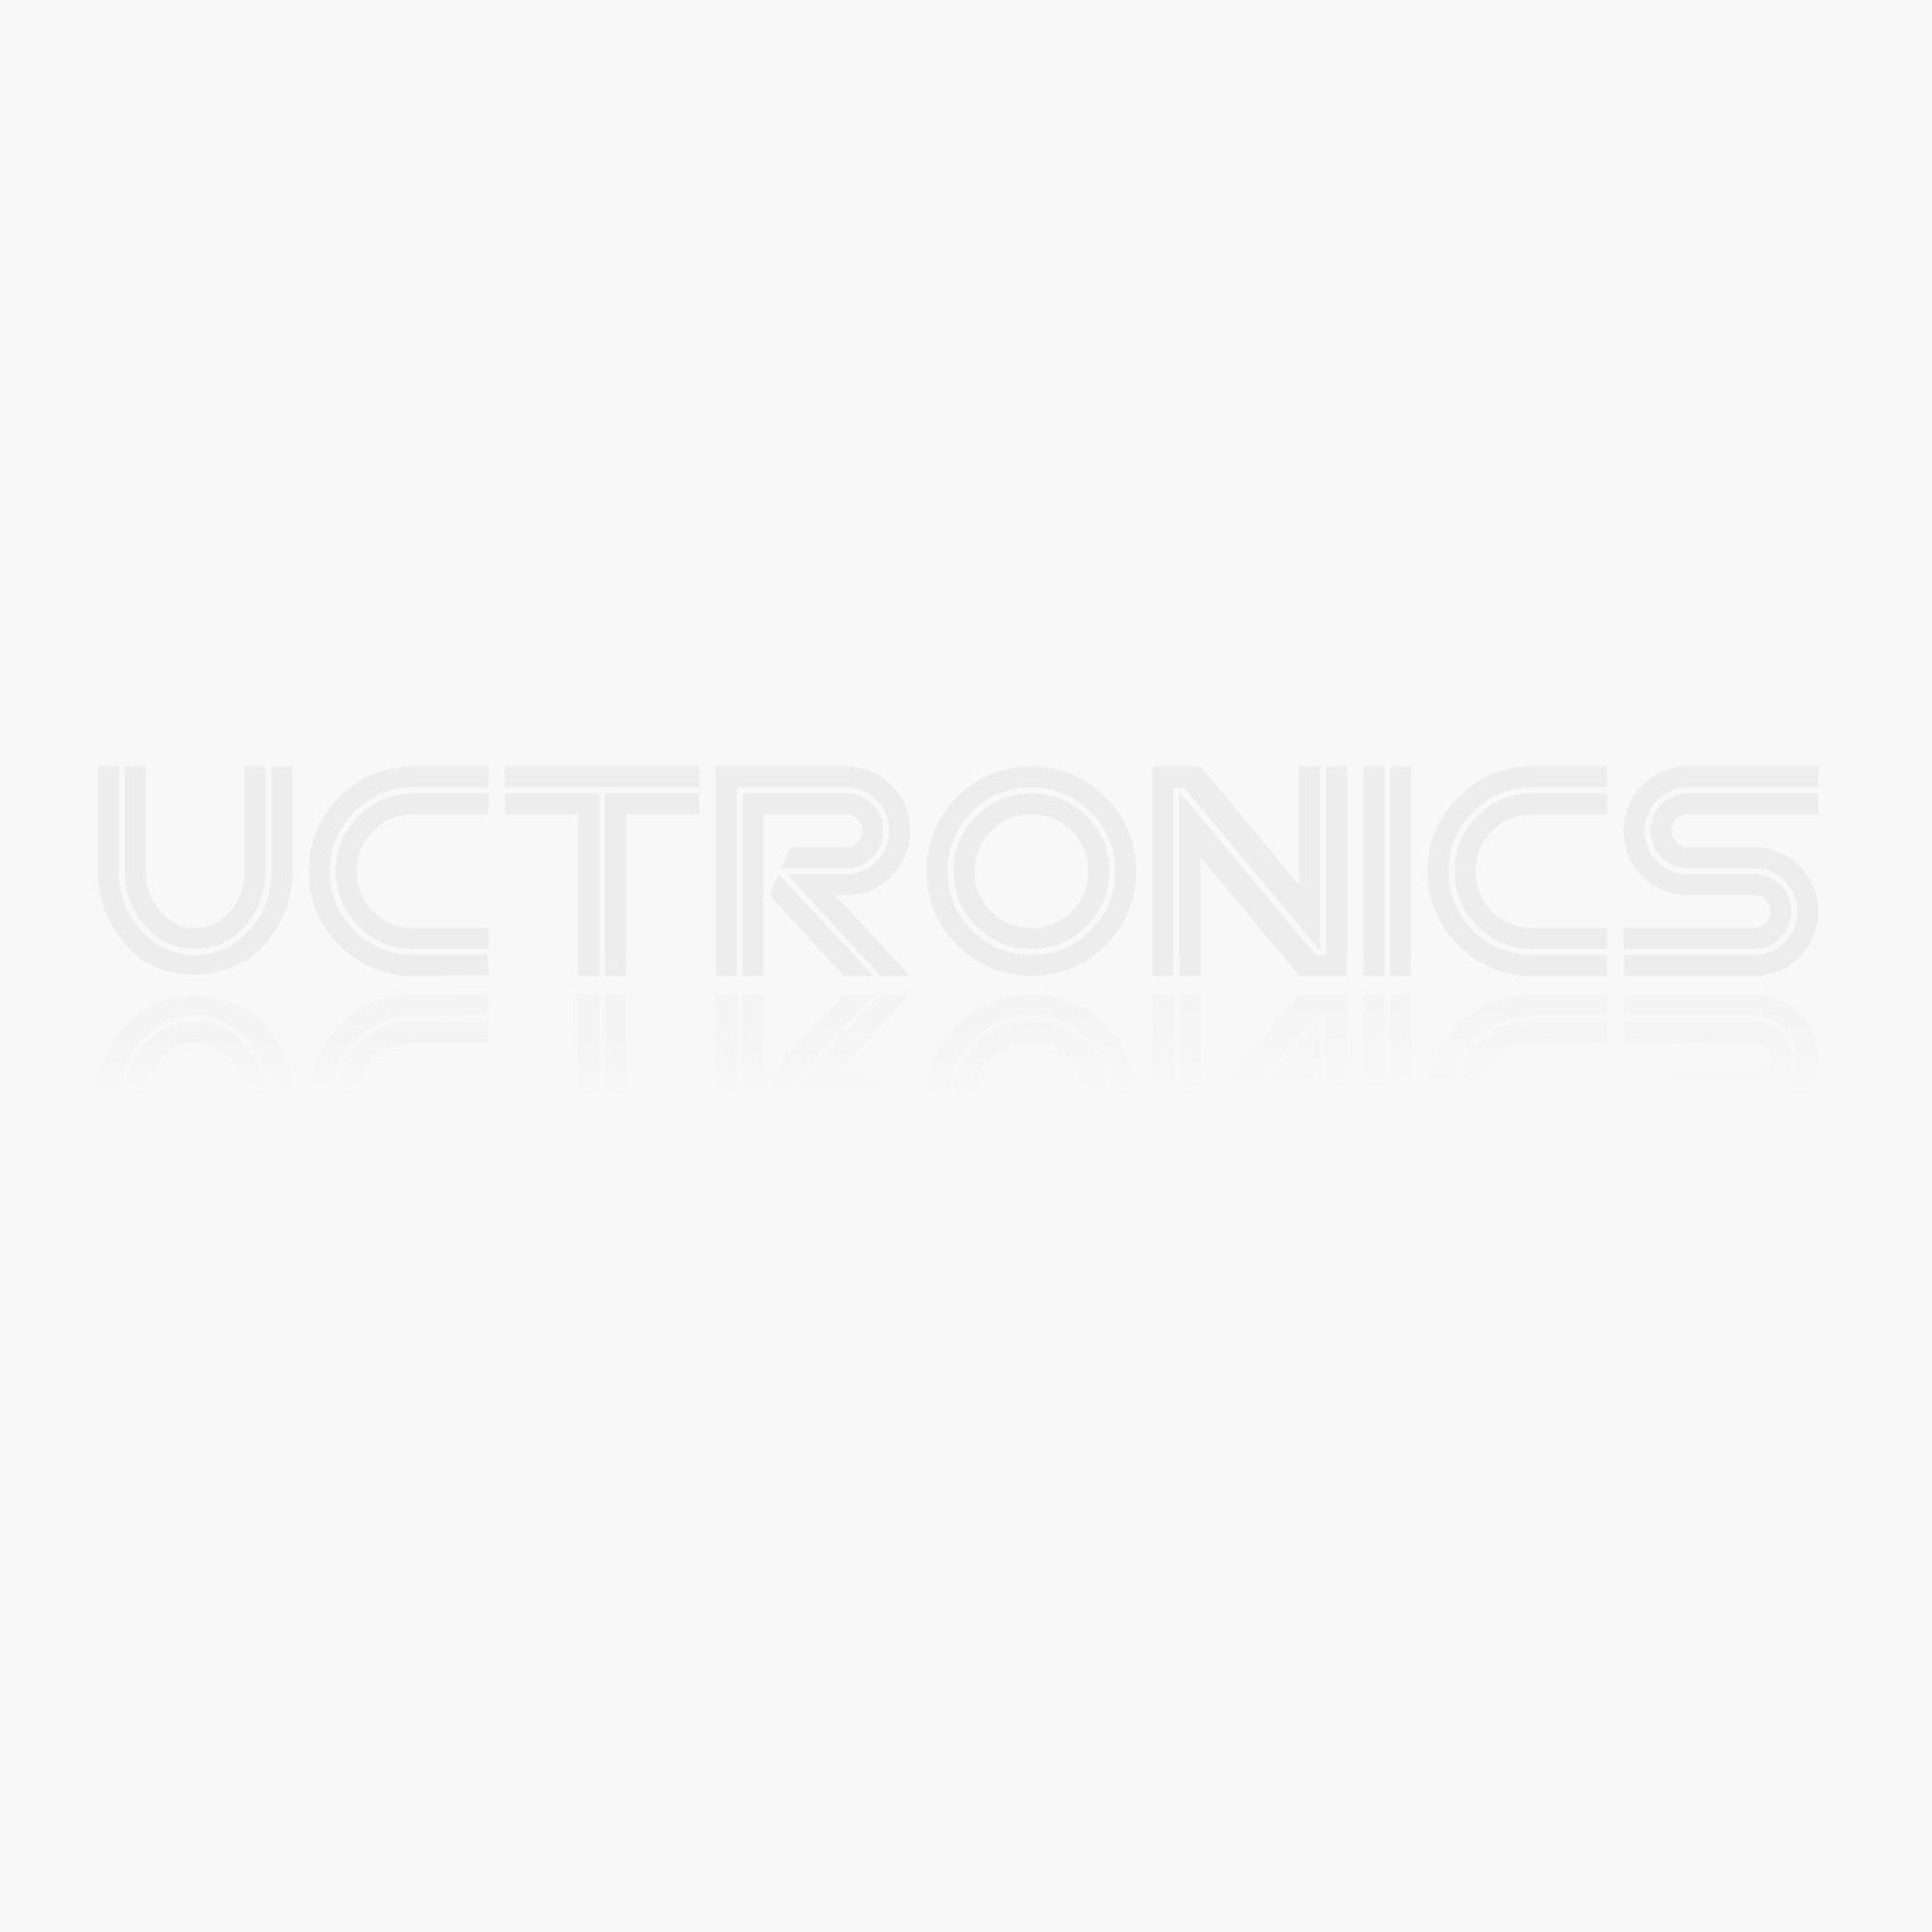 RTD PT1000 Thin Film Type Class A Temperature Sensor